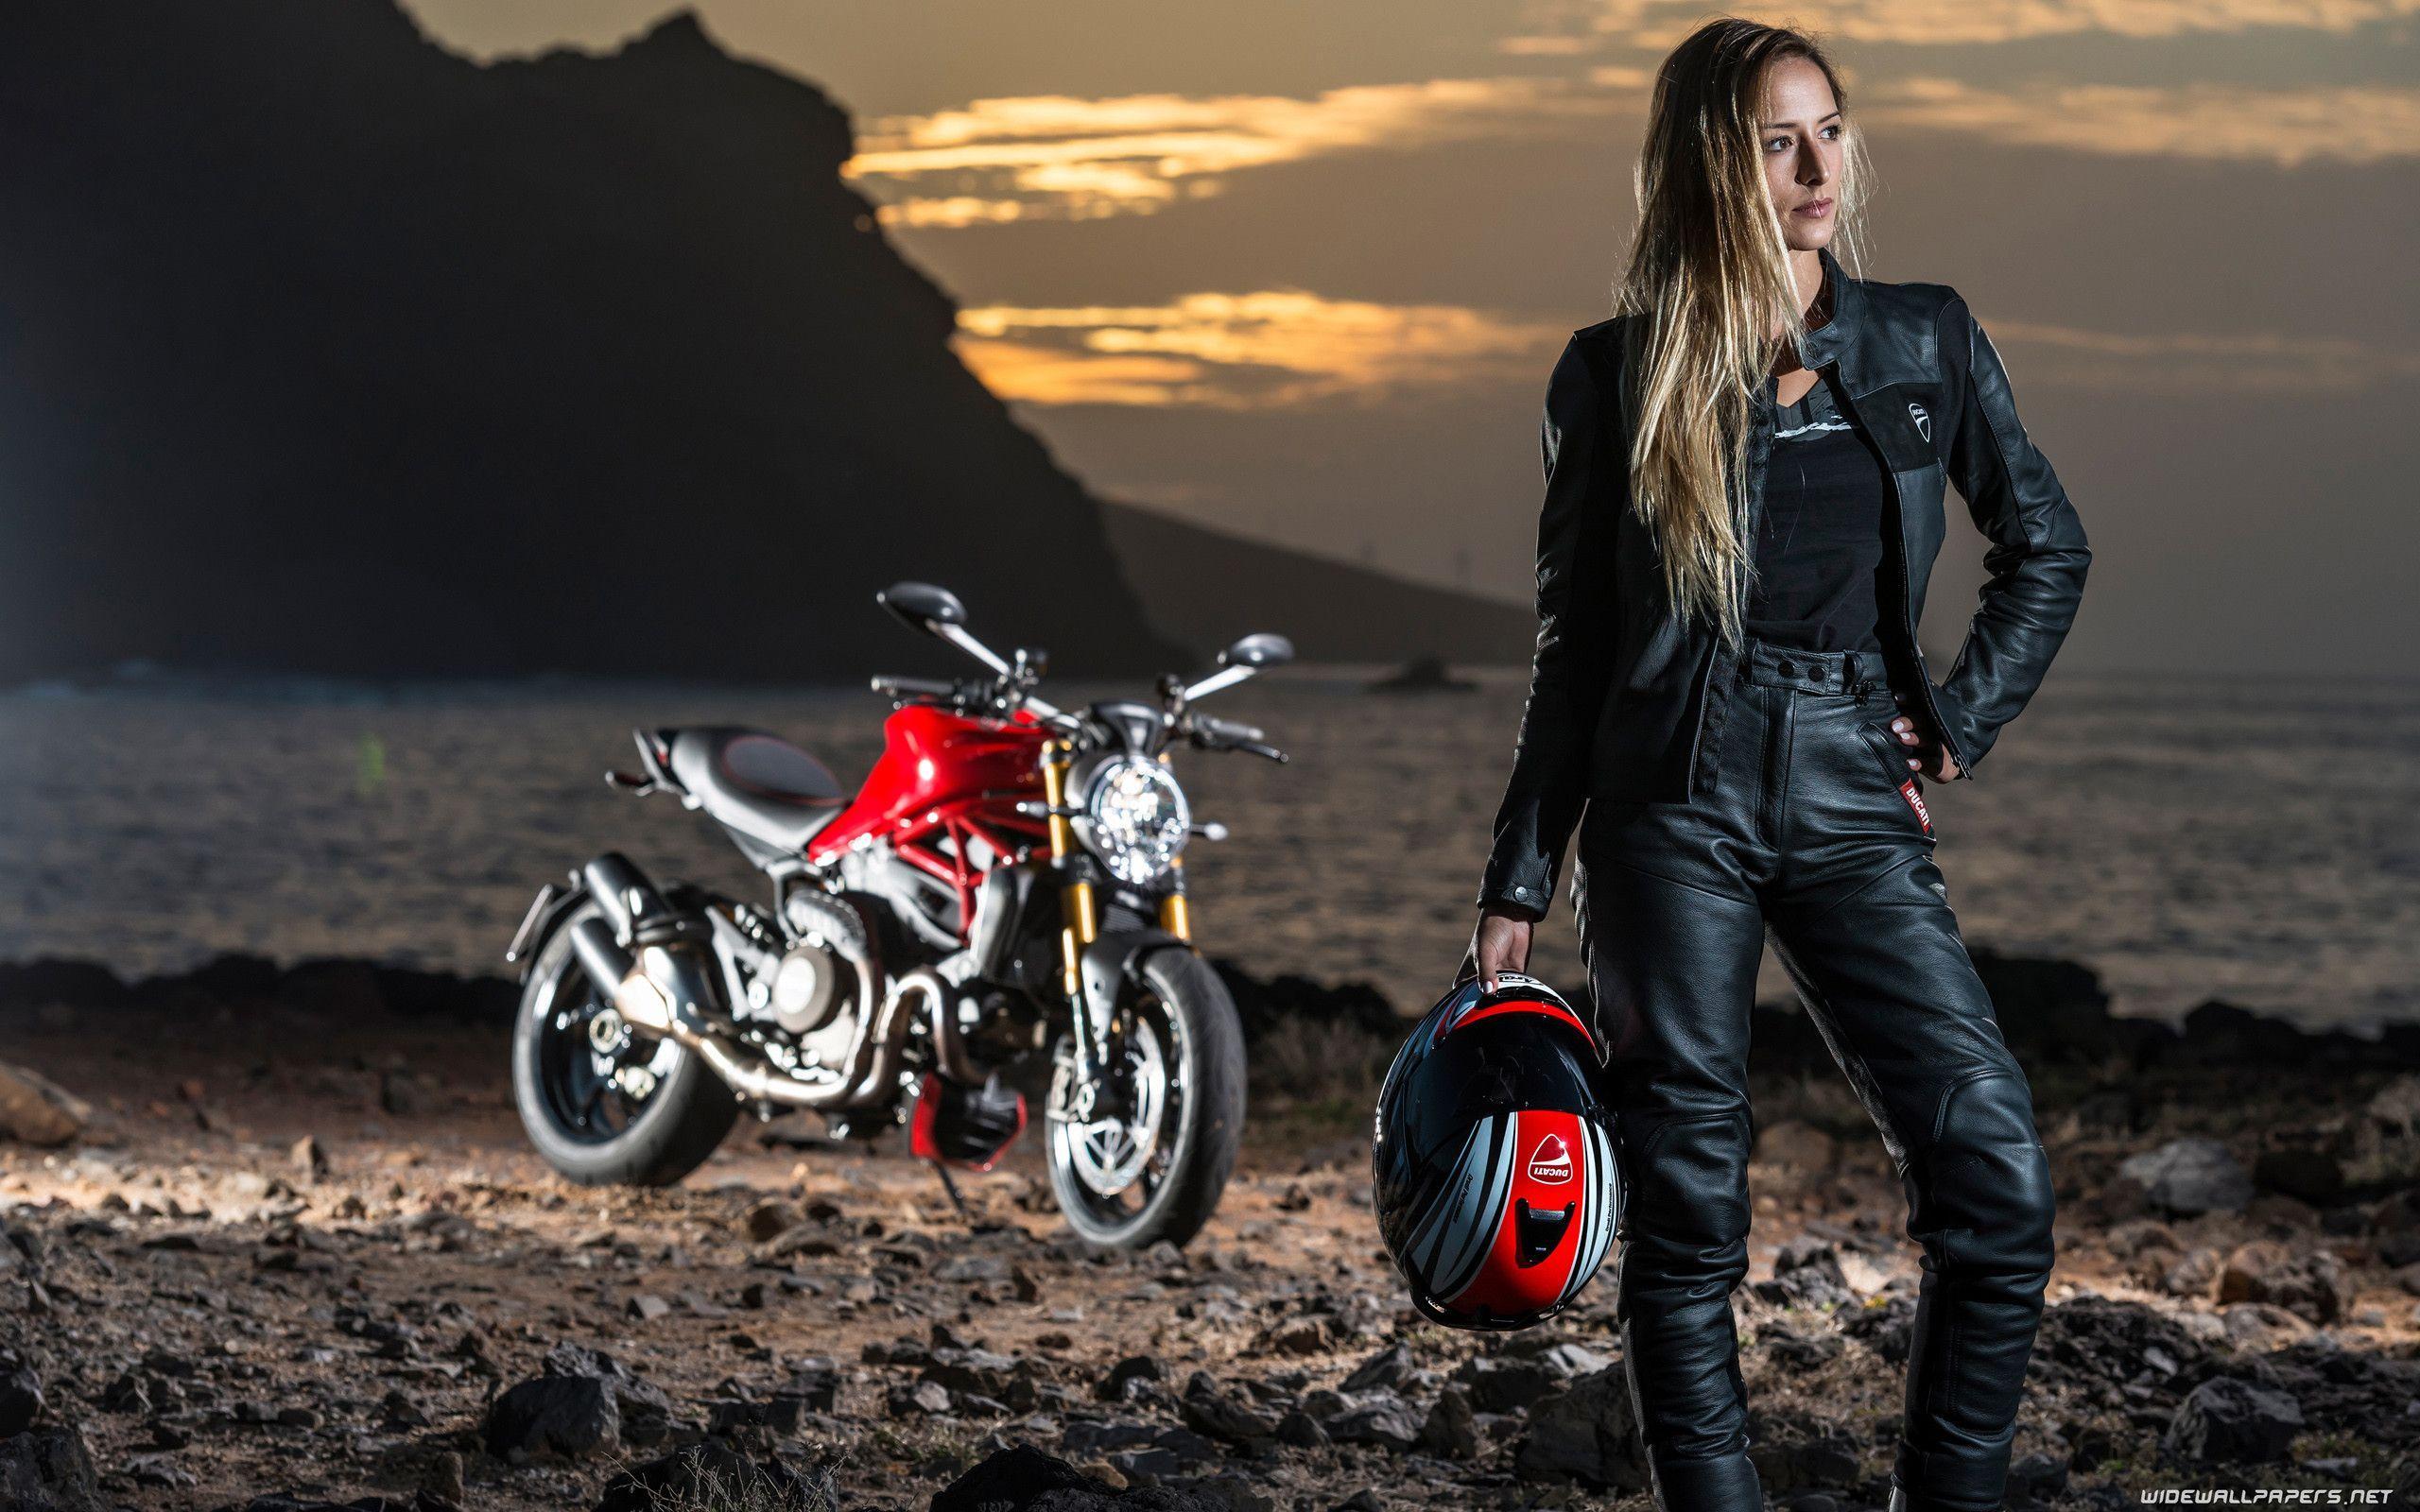 Bike Girl Wallpapers Top Free Bike Girl Backgrounds